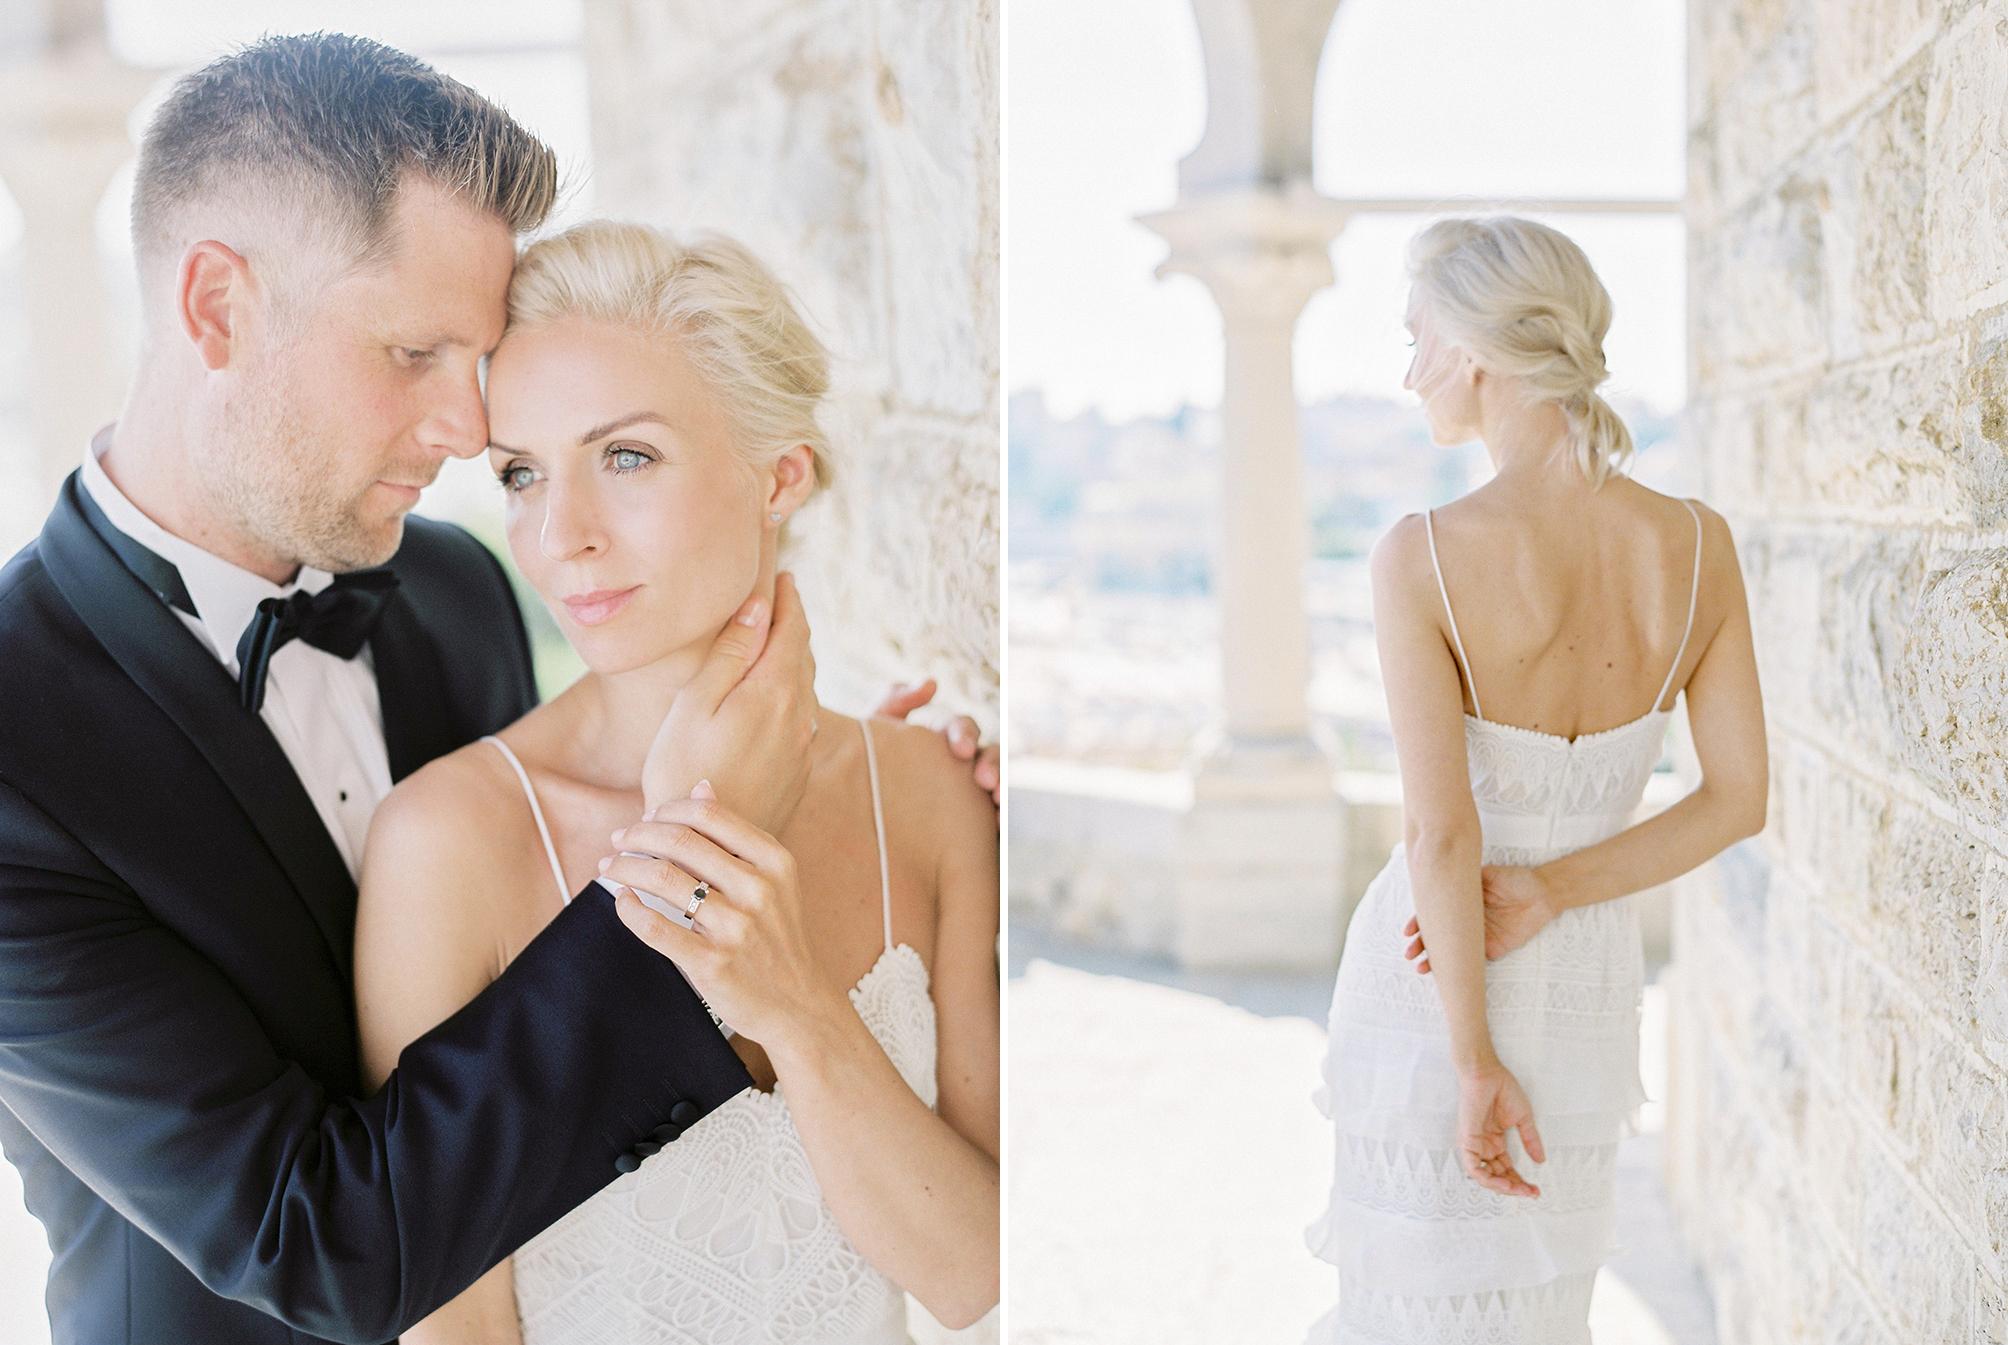 Nastia_Vesna_Photography_Wedding_Portugal_18.jpg